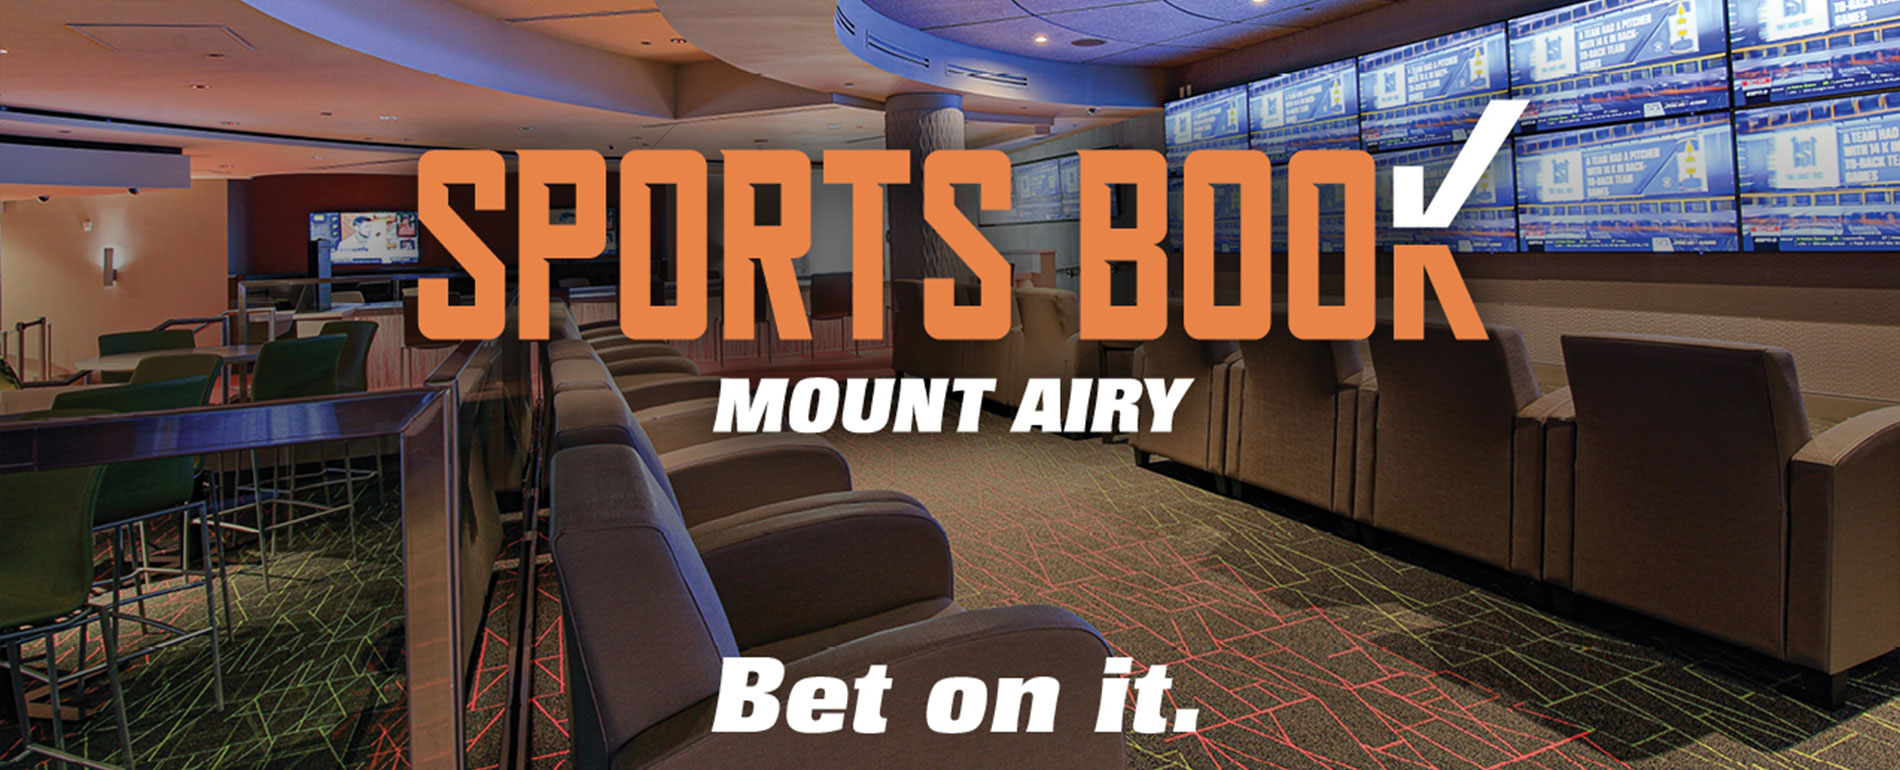 PA spotsbook lounge